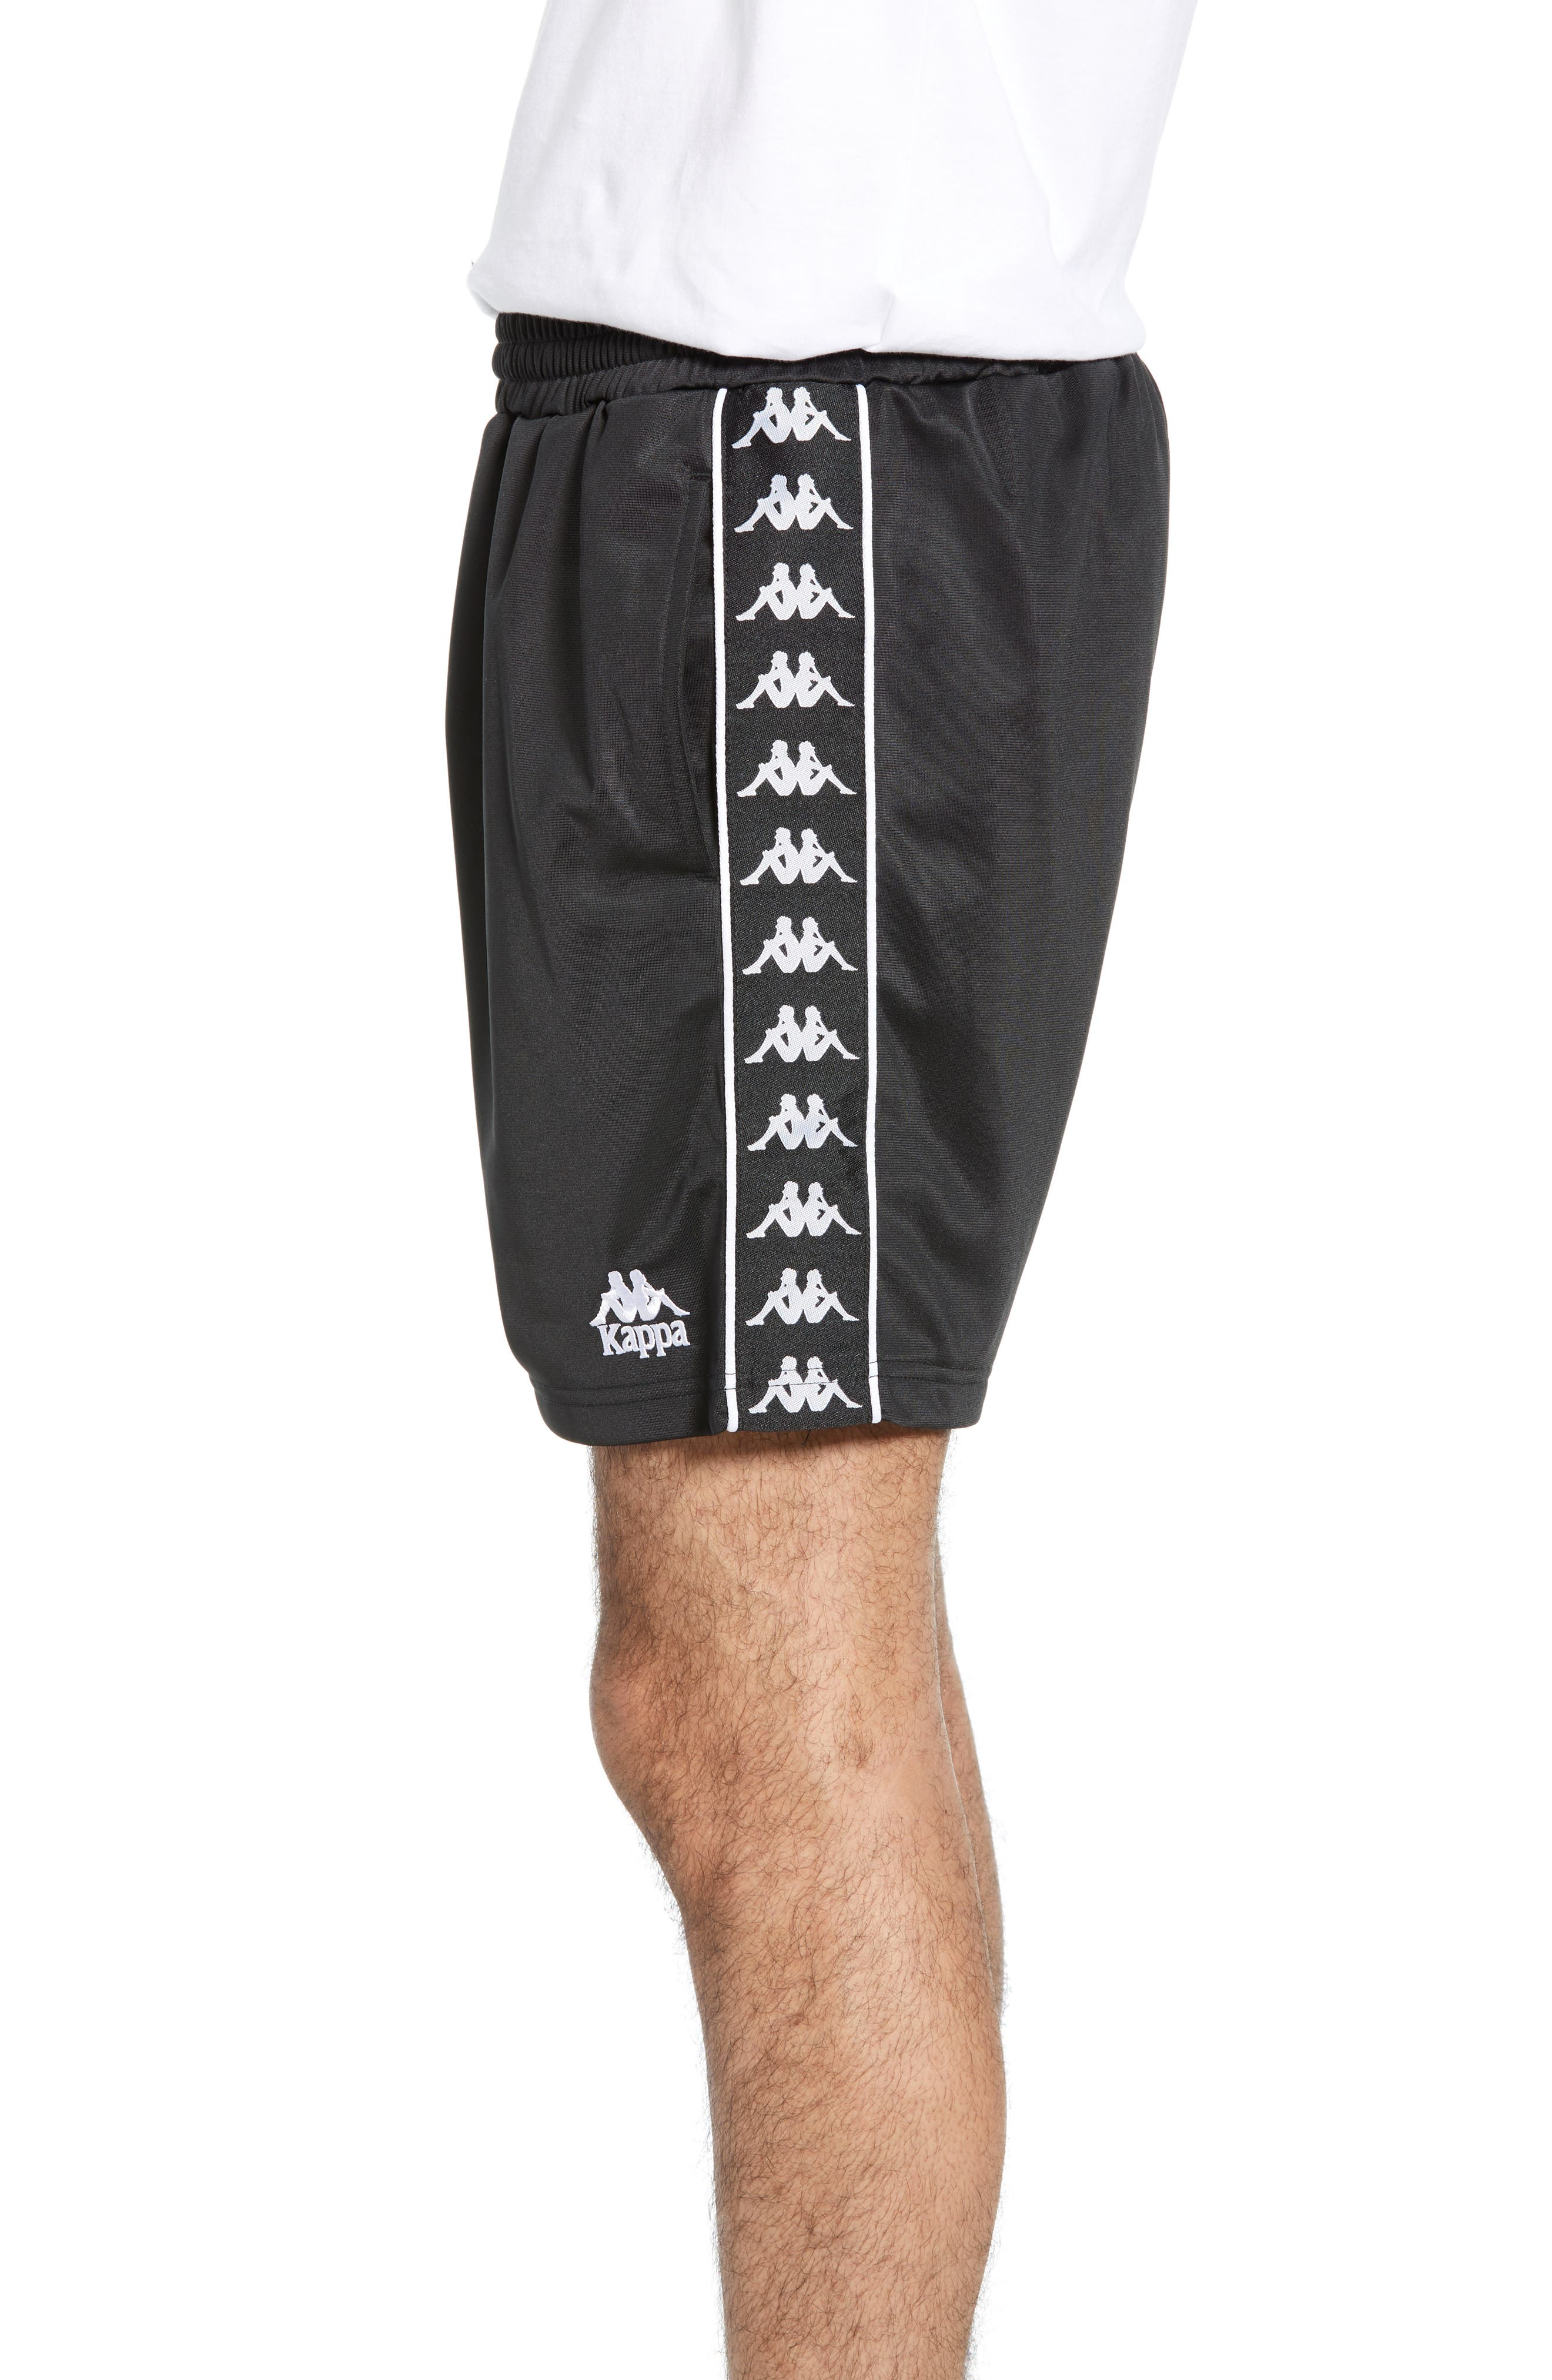 KAPPA, 222 Banda Cole Athletic Shorts, Alternate thumbnail 5, color, BLACK/ WHITE